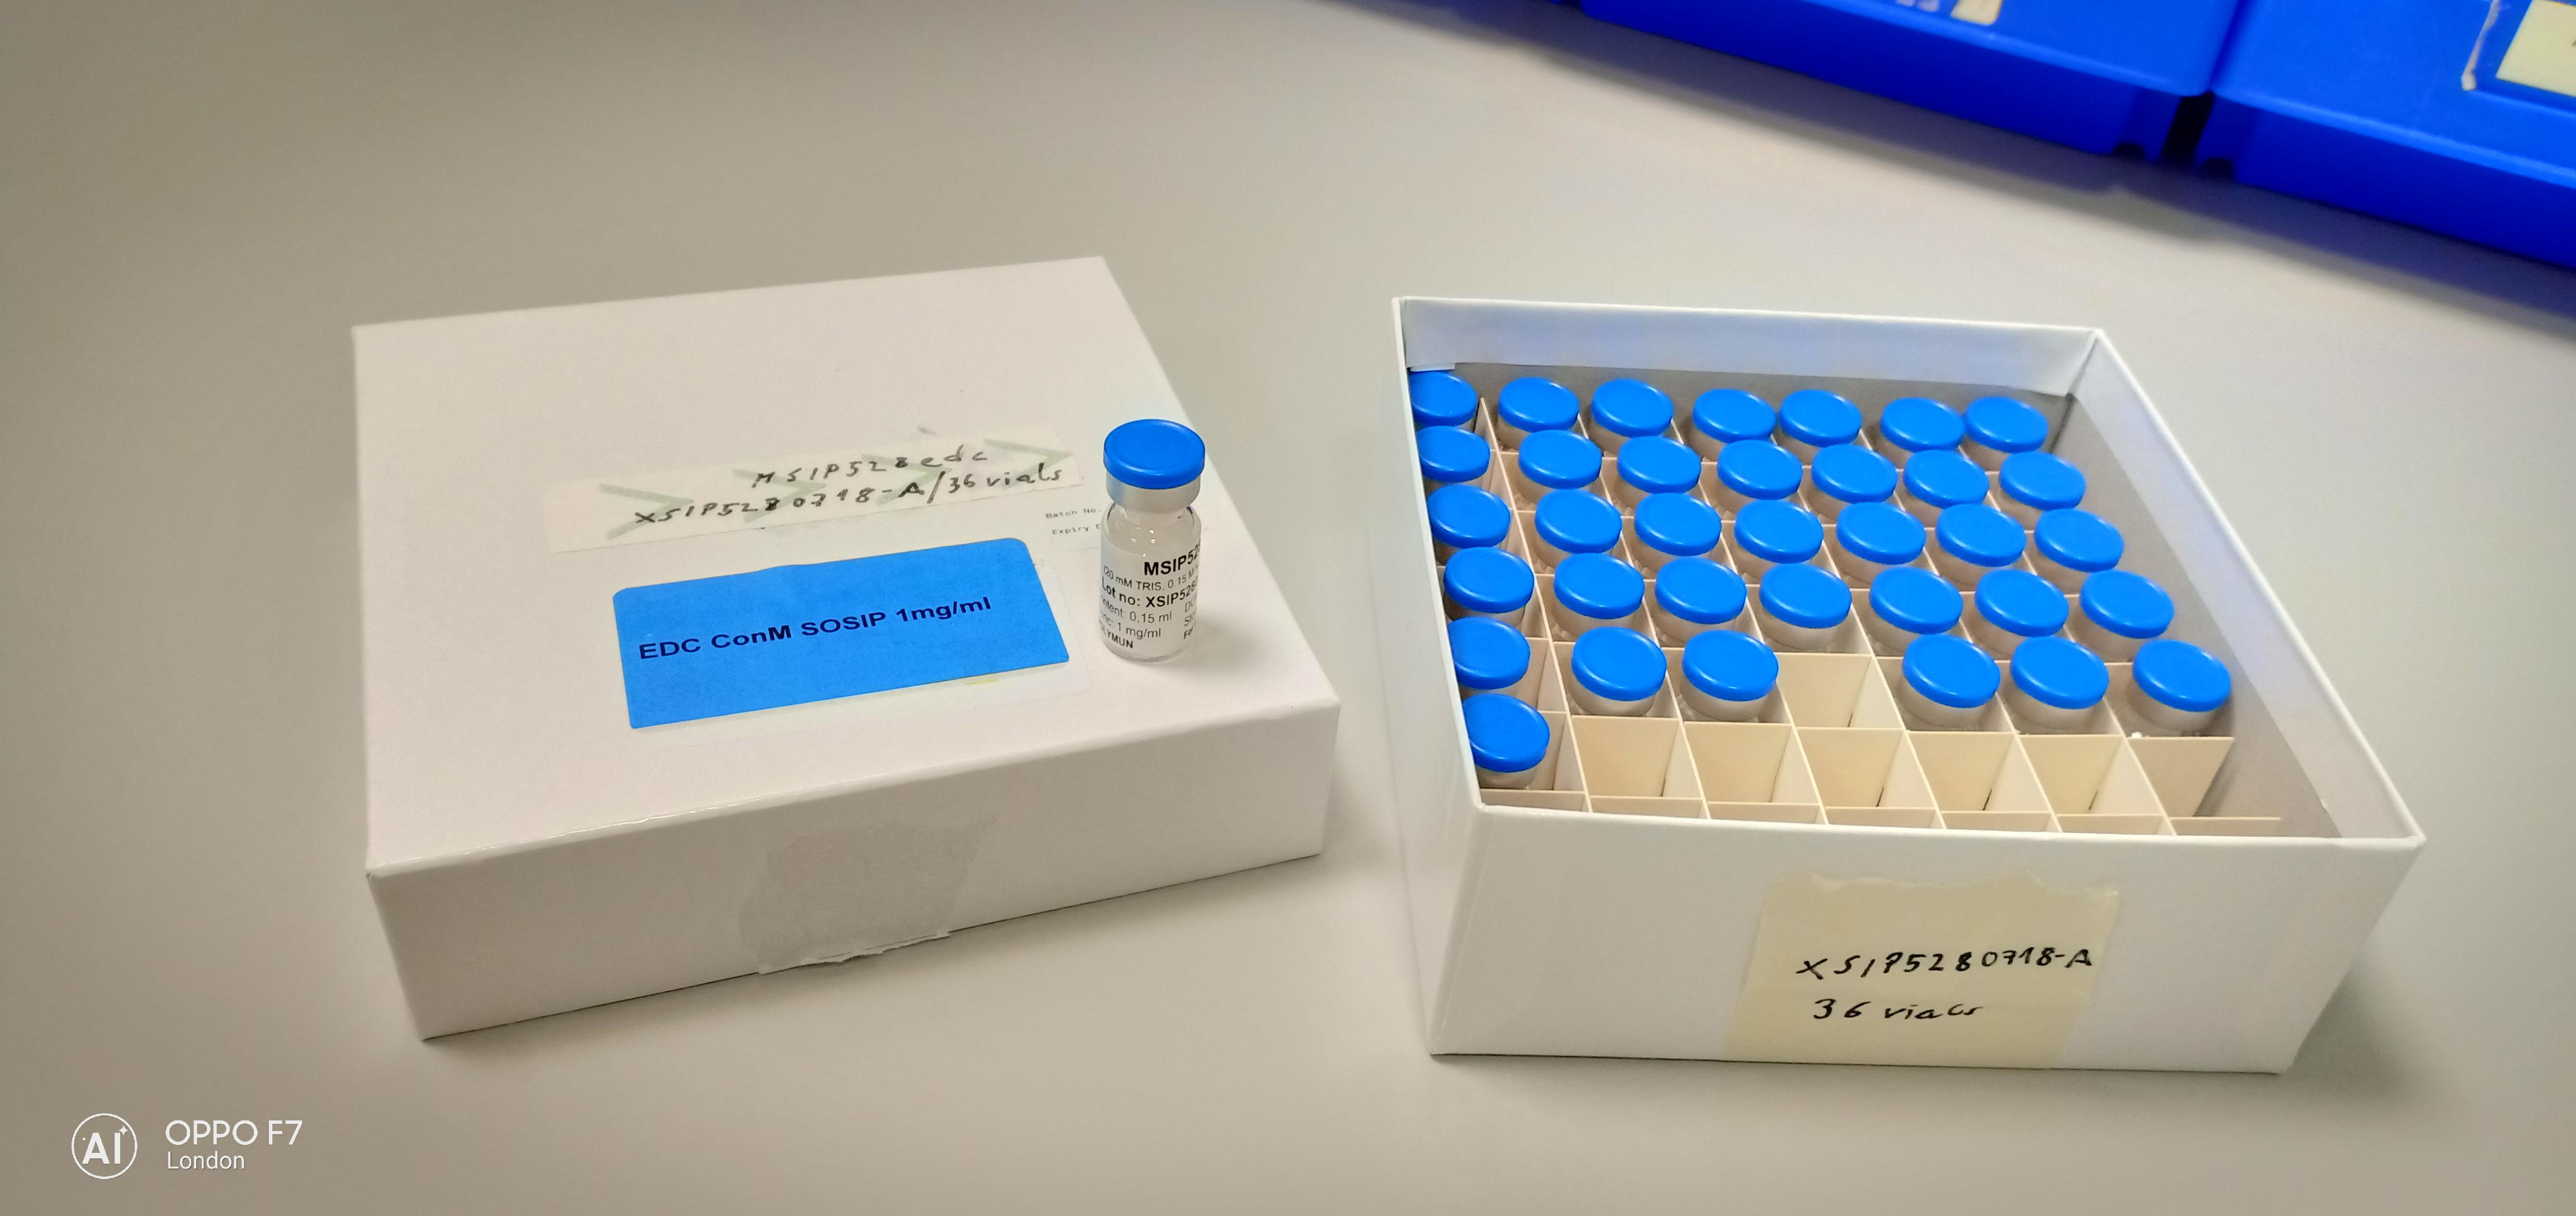 opened box of 50 glass vials